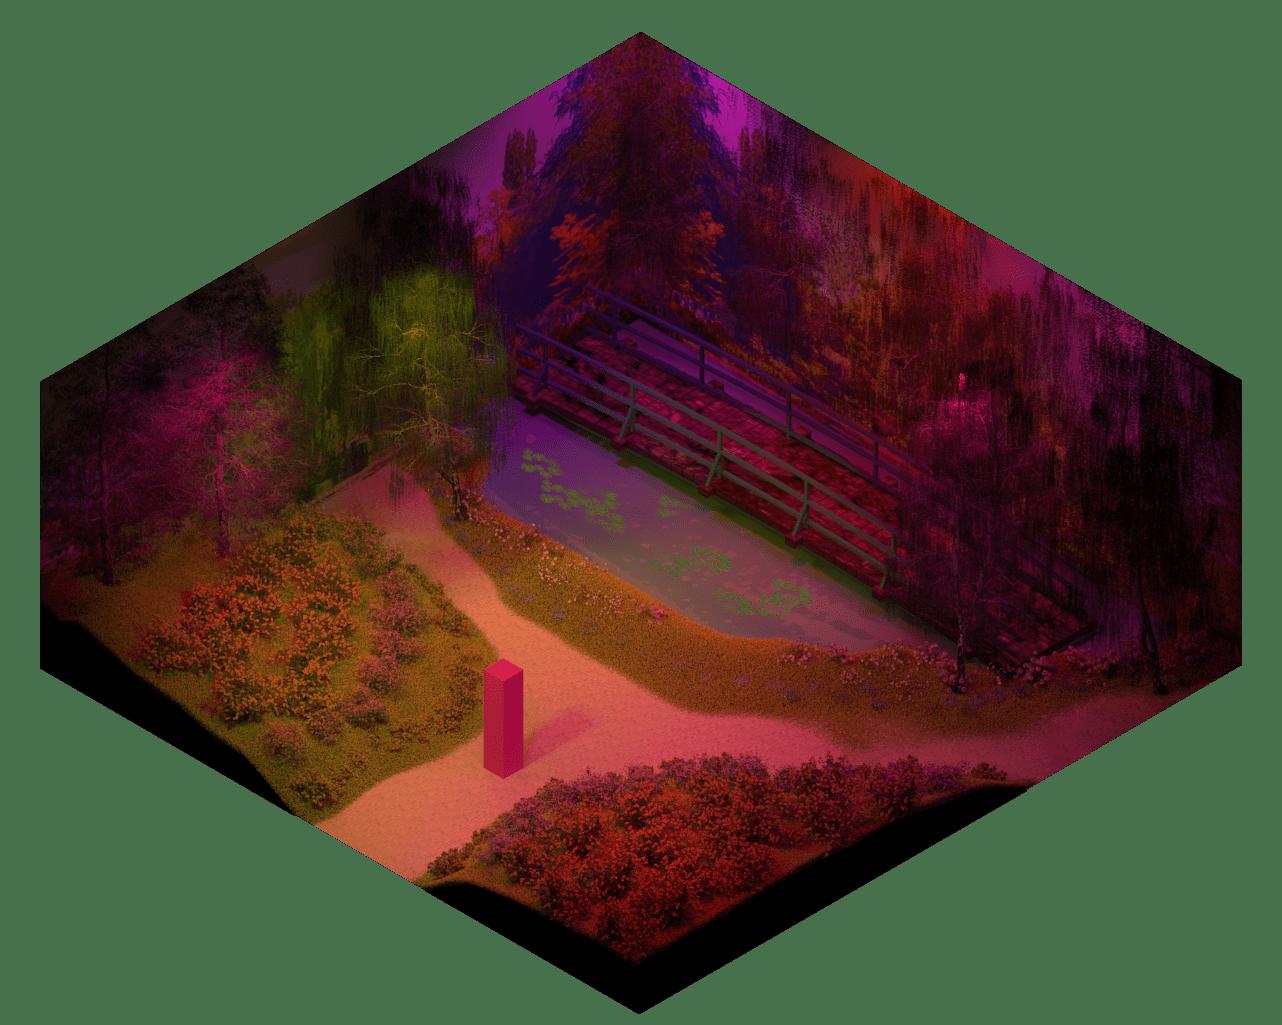 3D model of Monet's Garden at night.